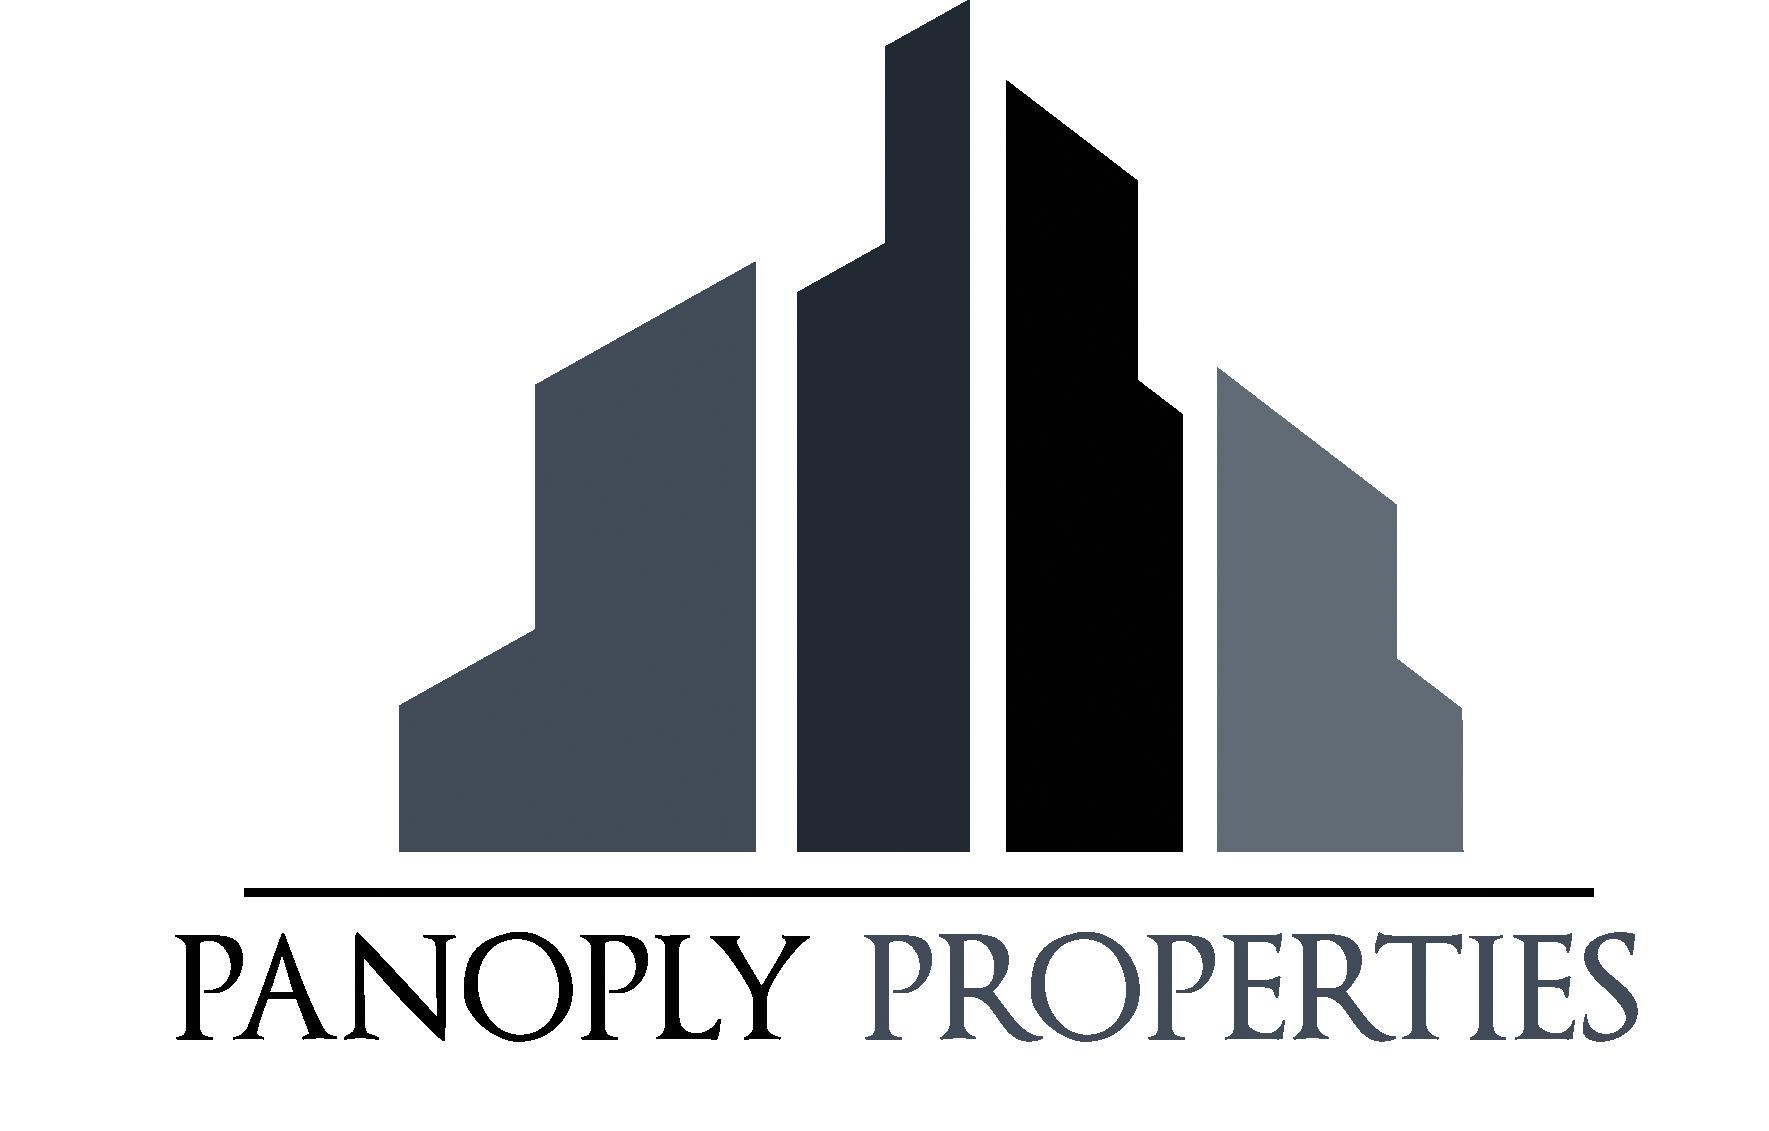 Panoply Properties Grey.png